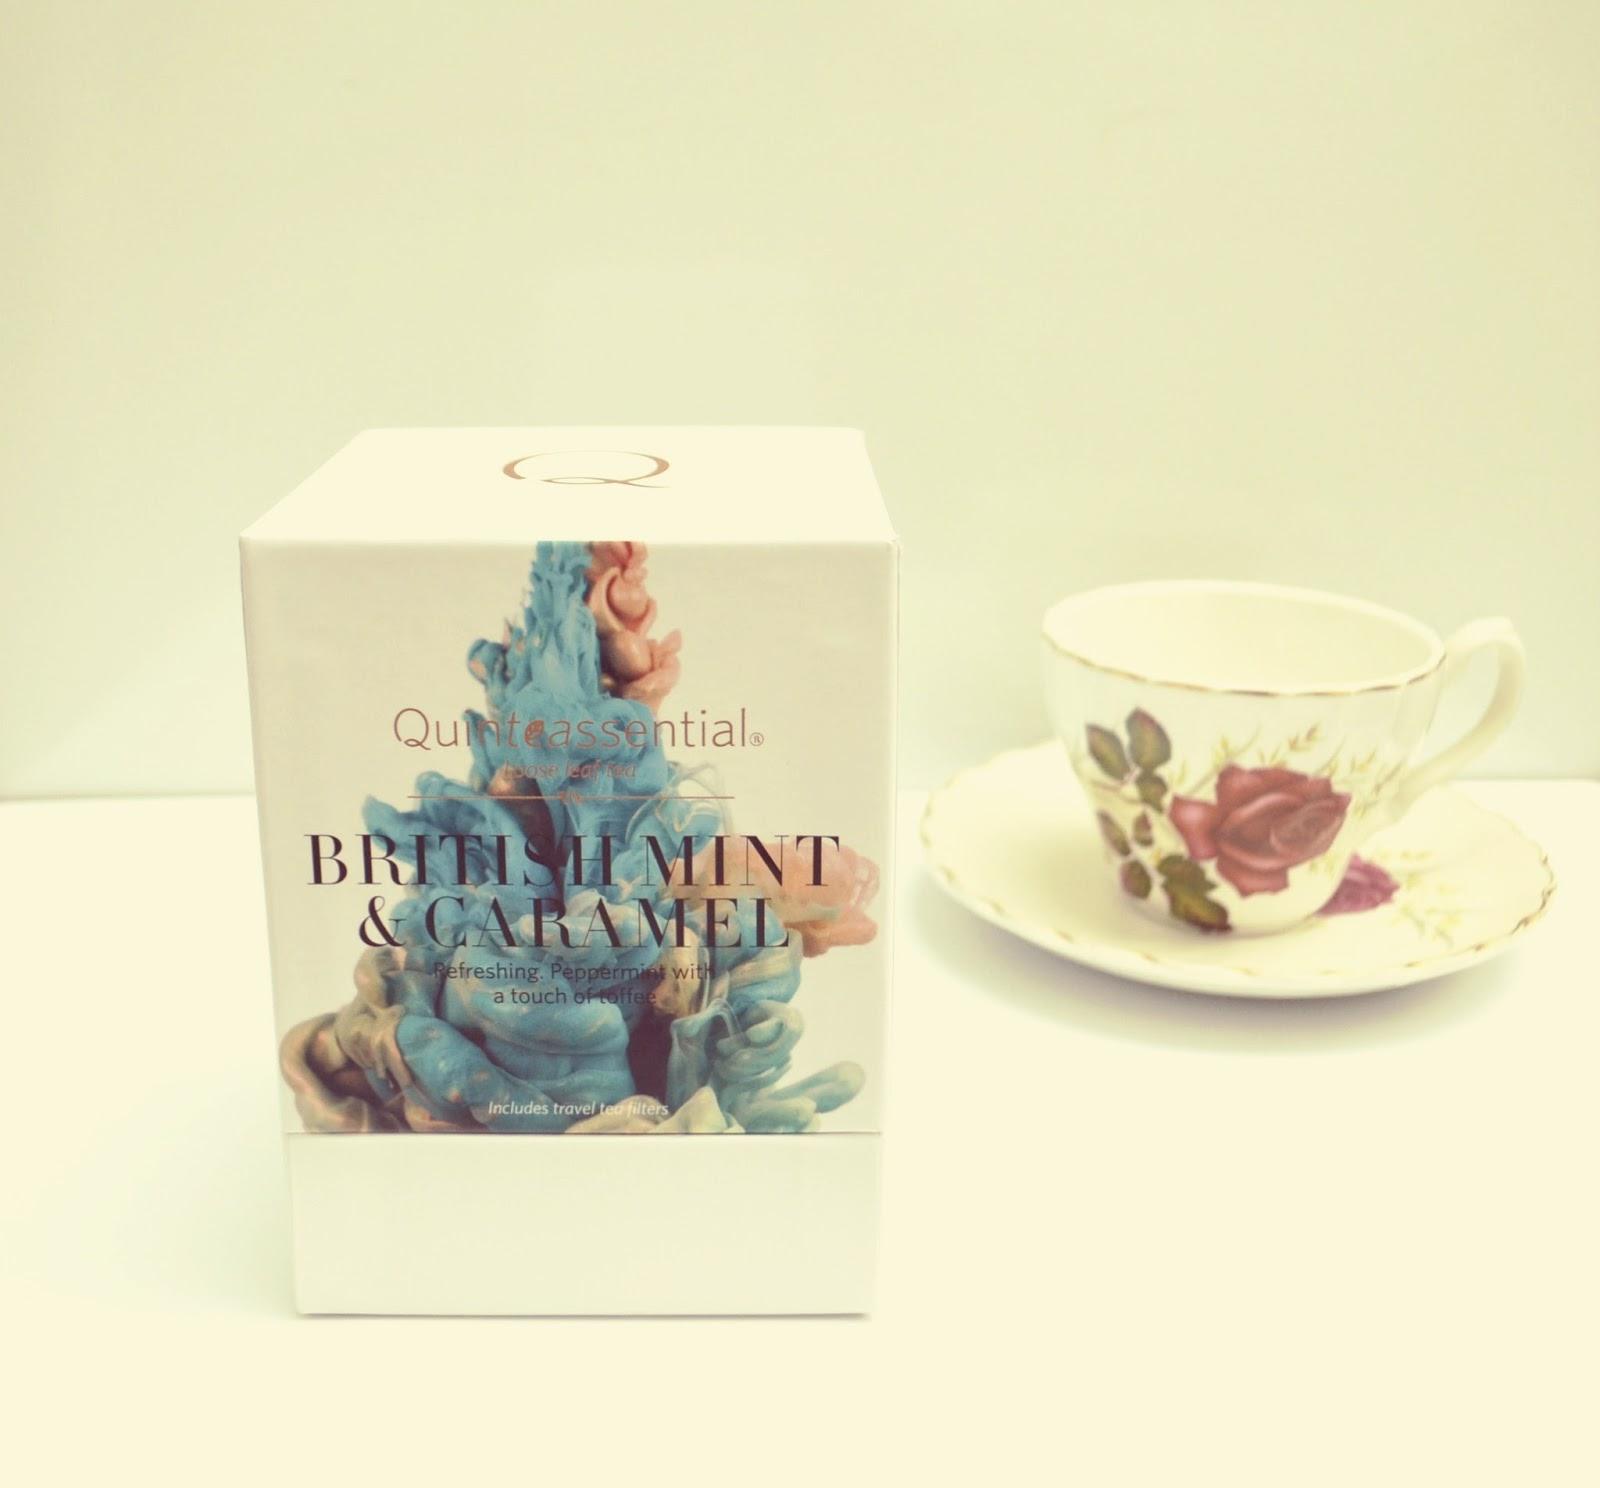 Quinteassential Teas British Mint & Caramel Review